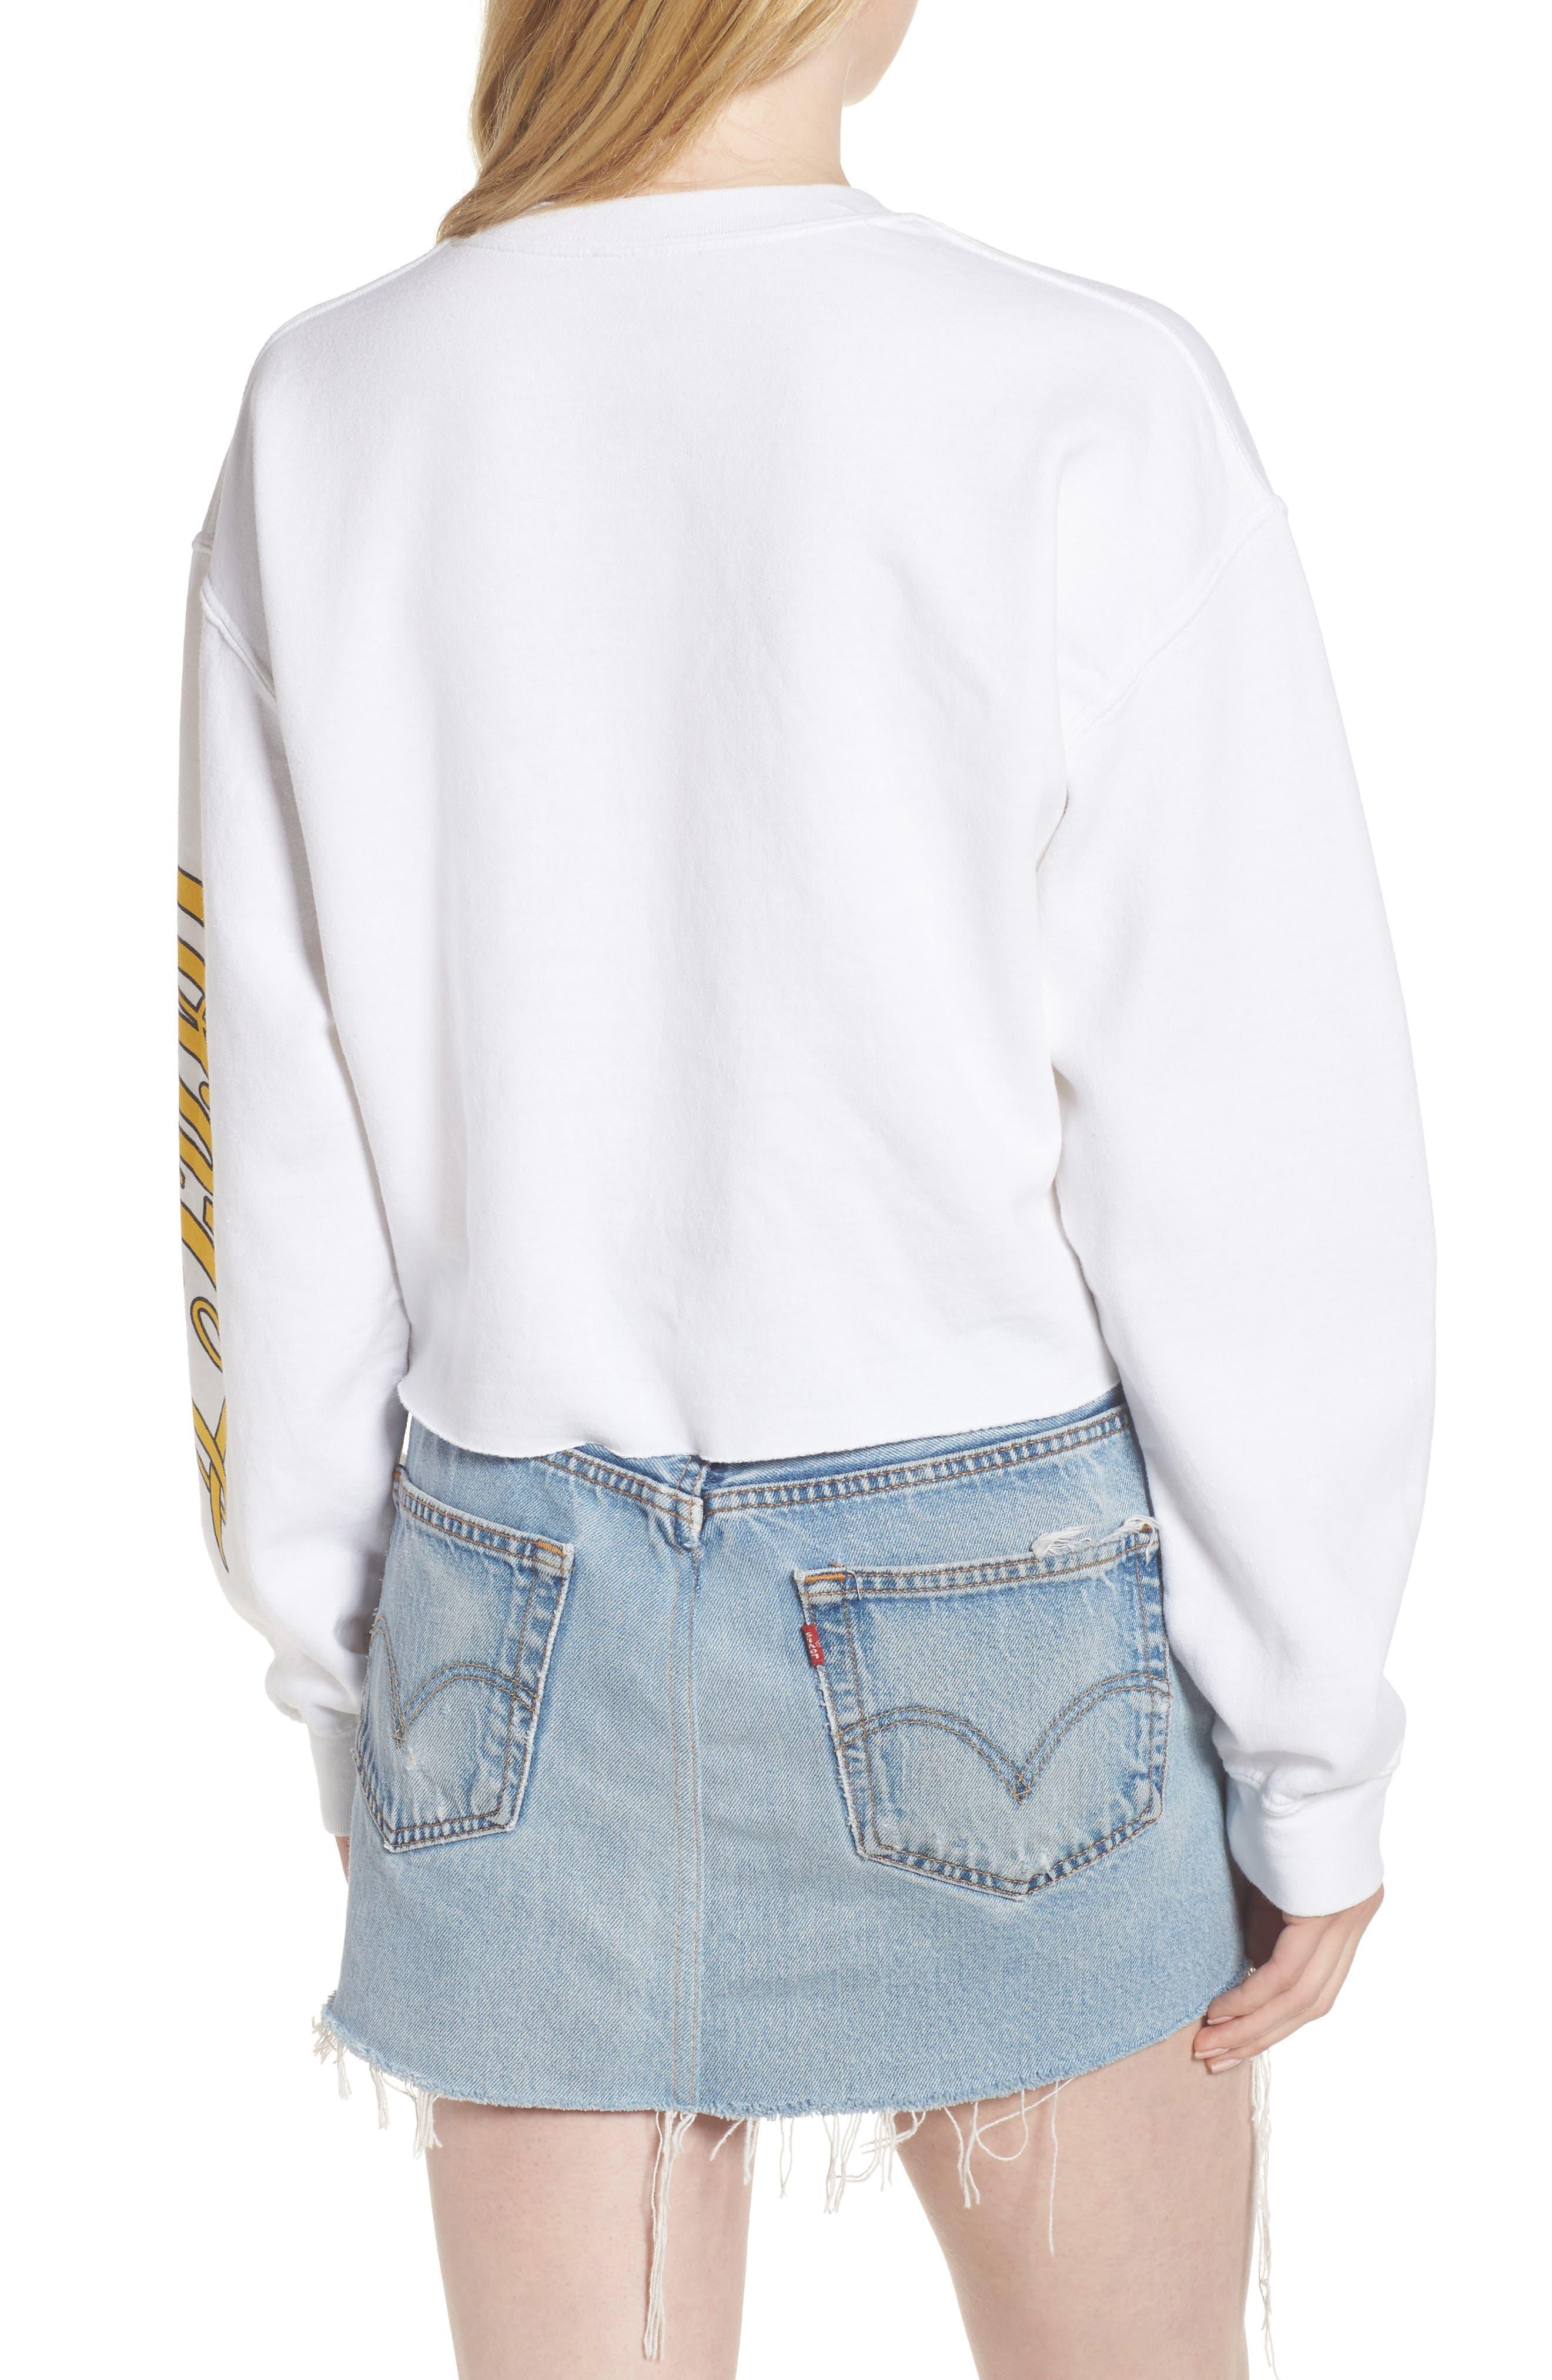 Coke Stars Crop Sweatshirt,                             Alternate thumbnail 2, color,